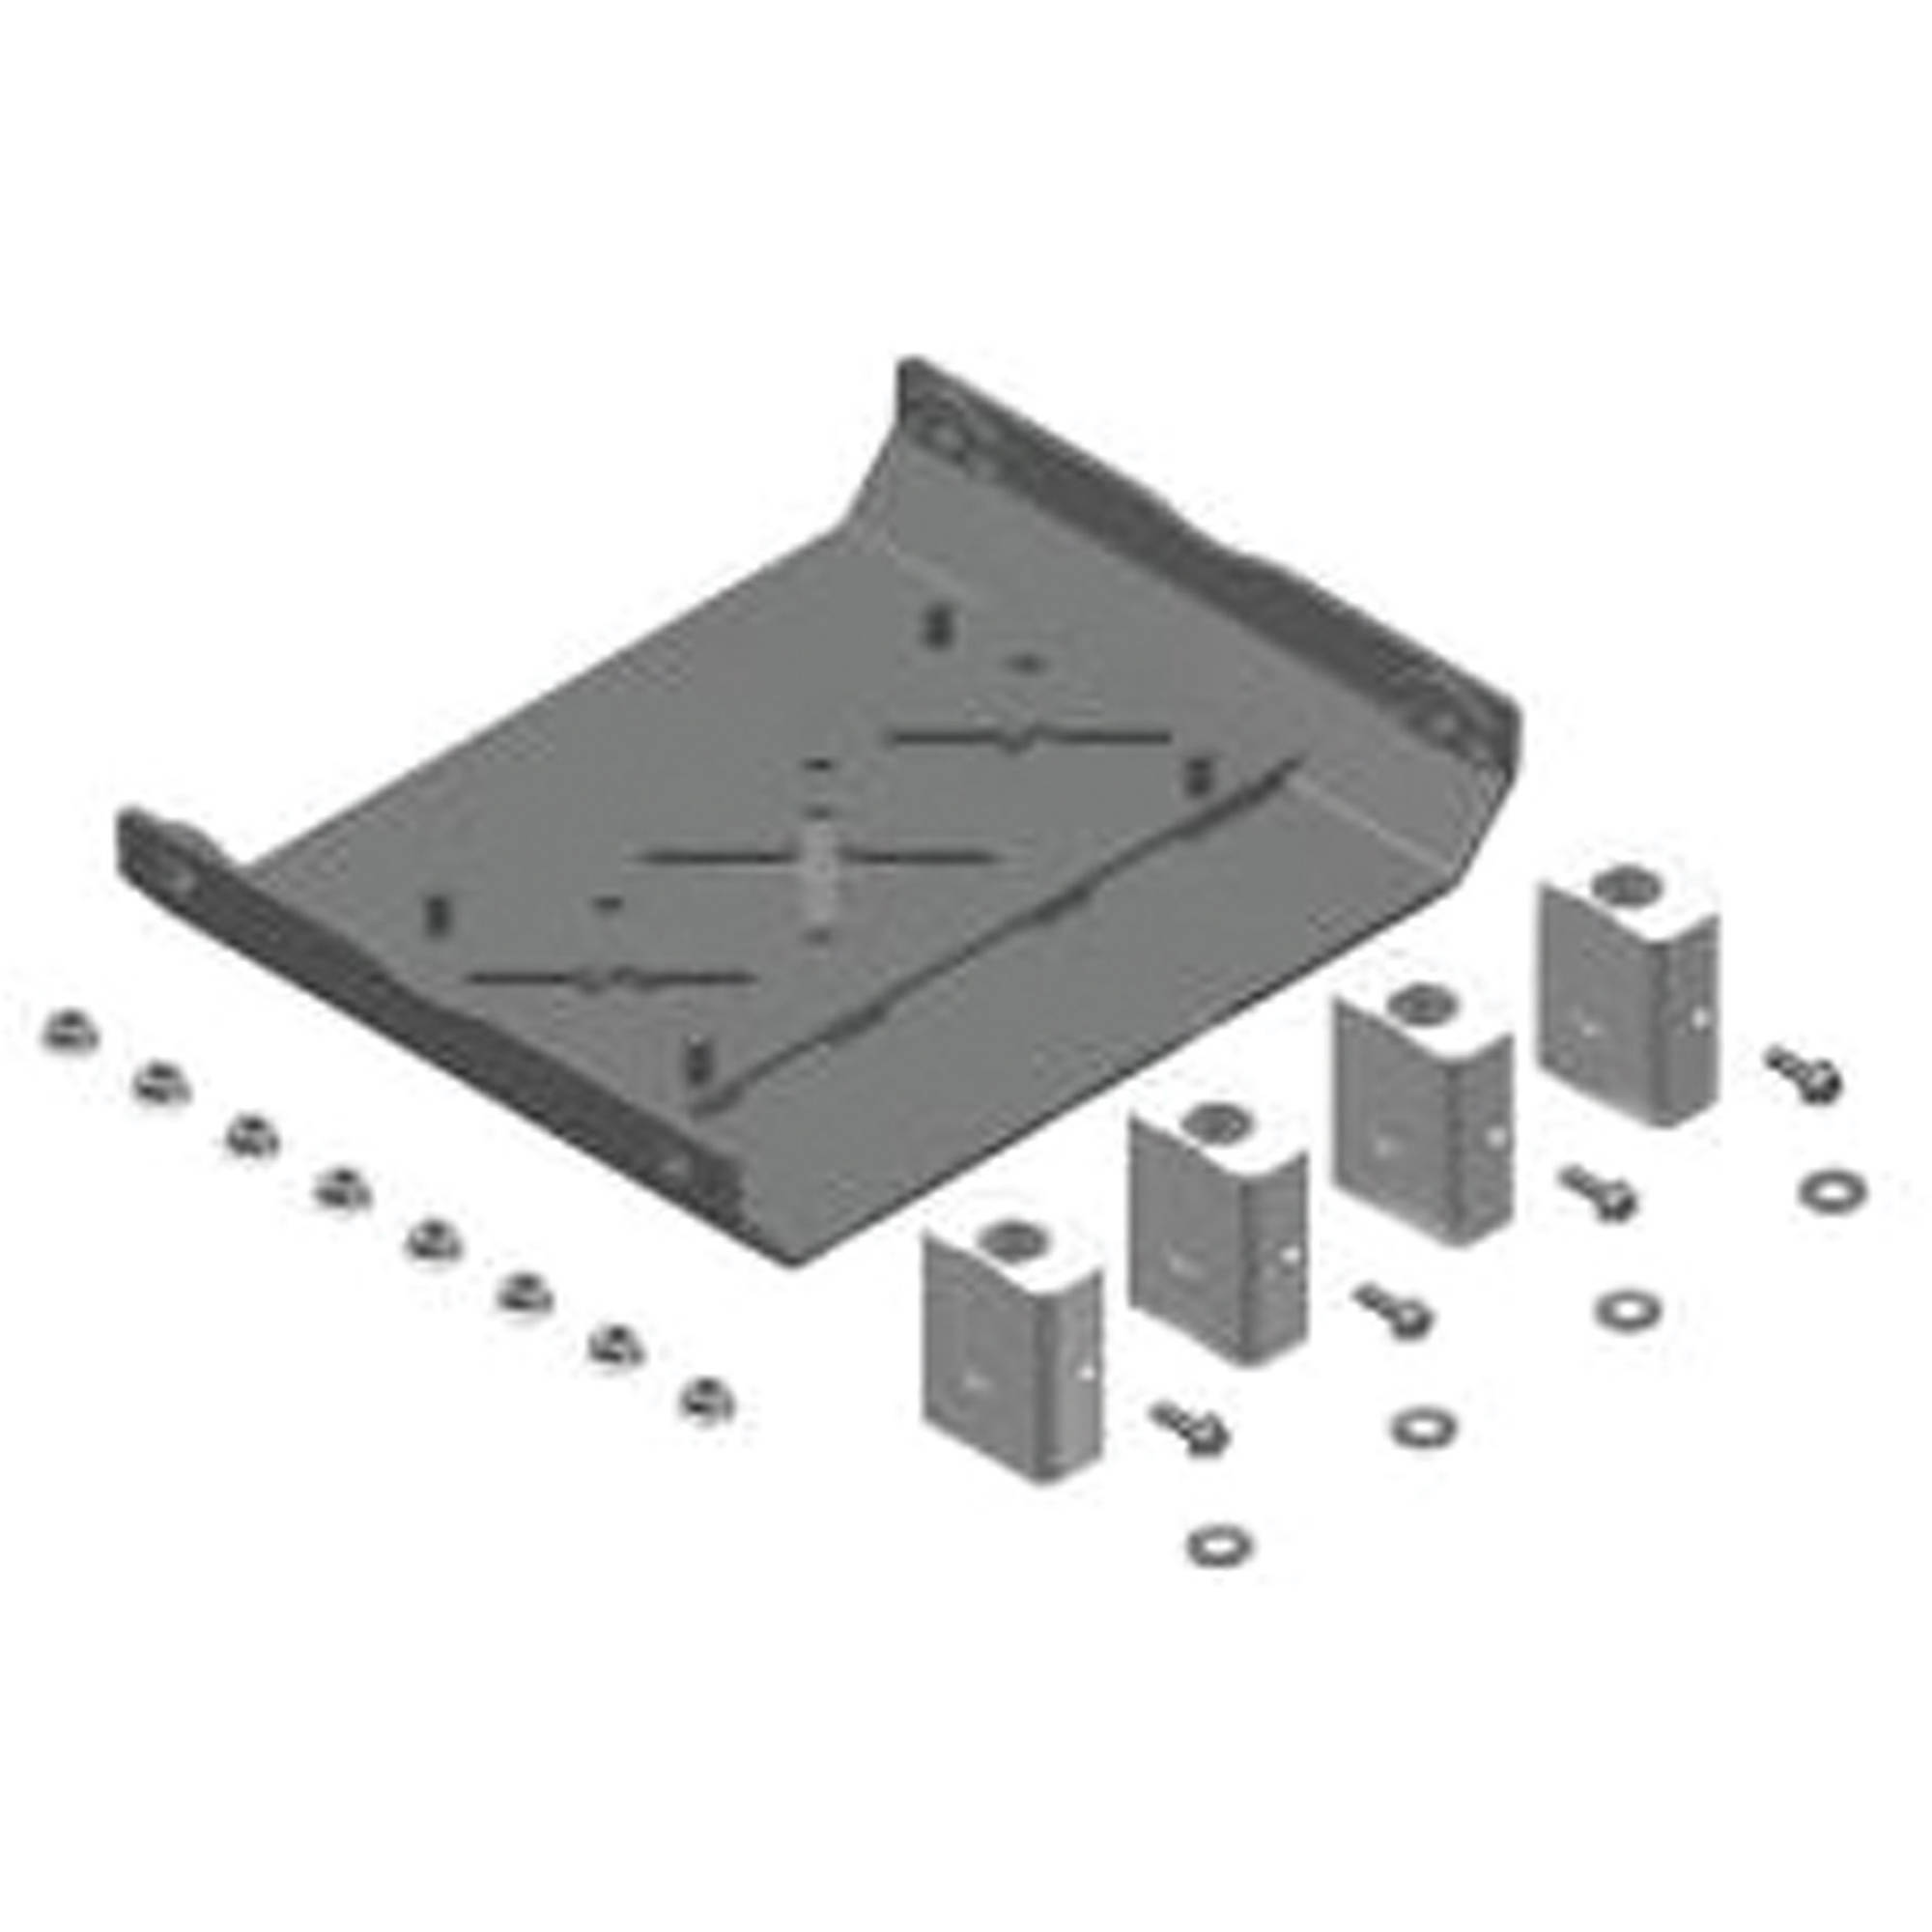 MORryde RPB77-006 Pin Box System Adapter Kit Adapter Kit for Gooseneck